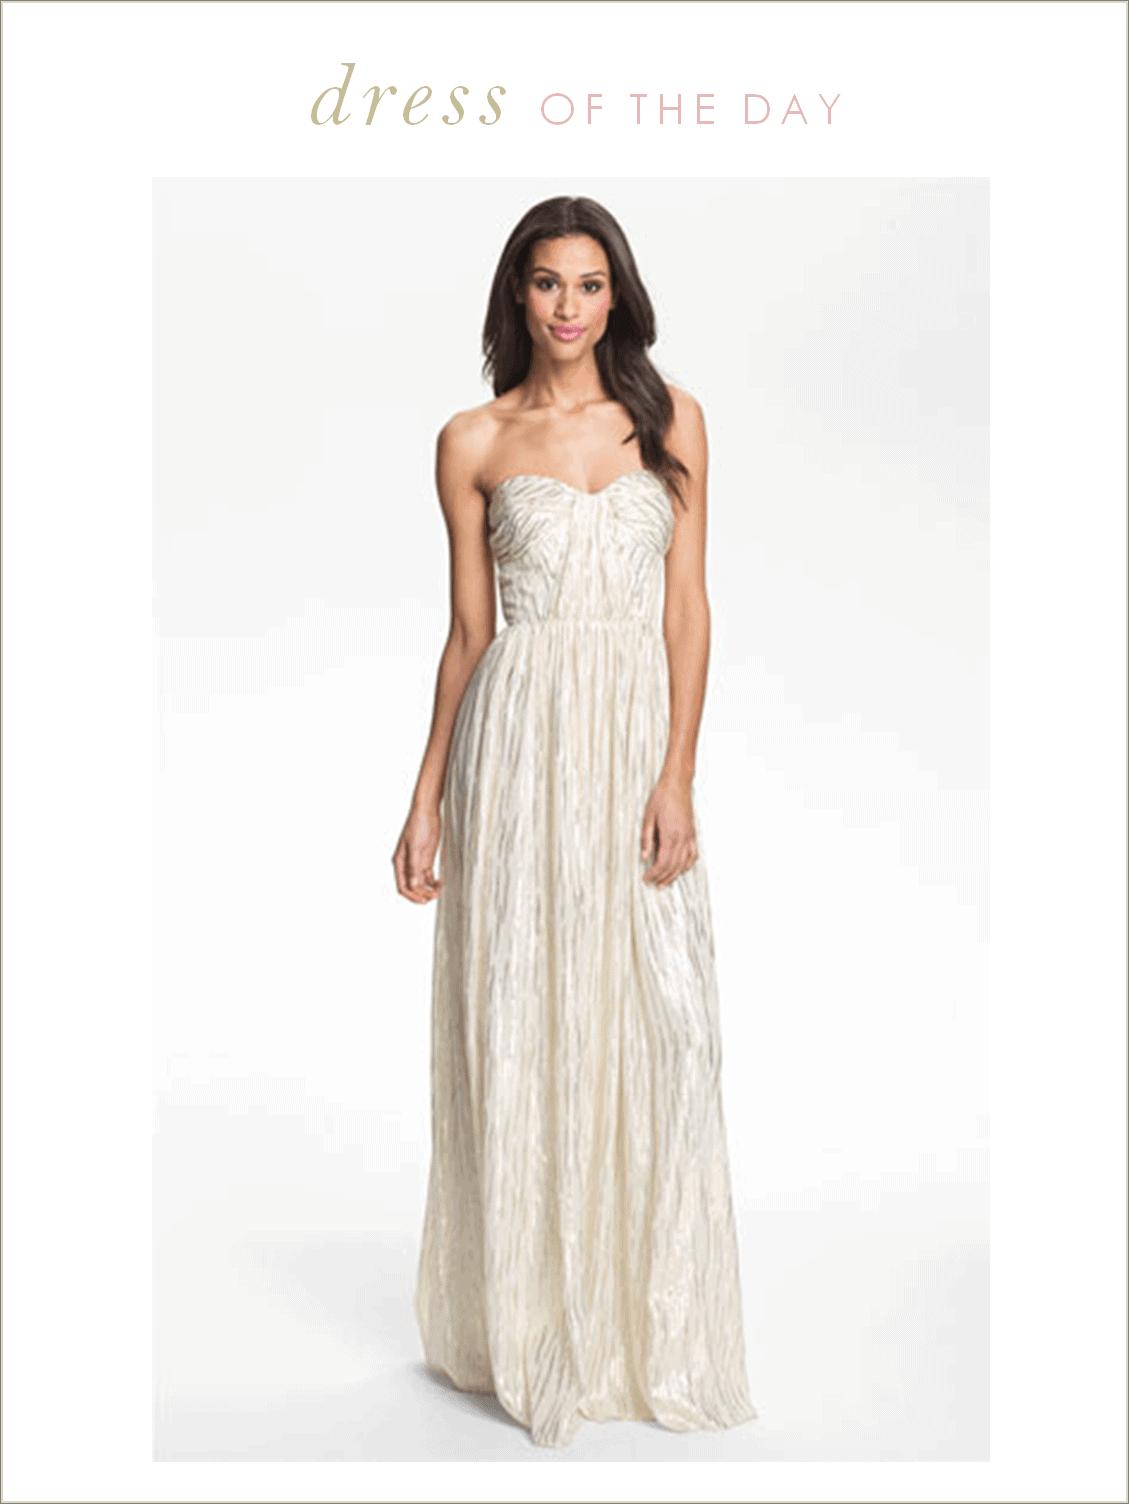 Leighton meester black and white dress